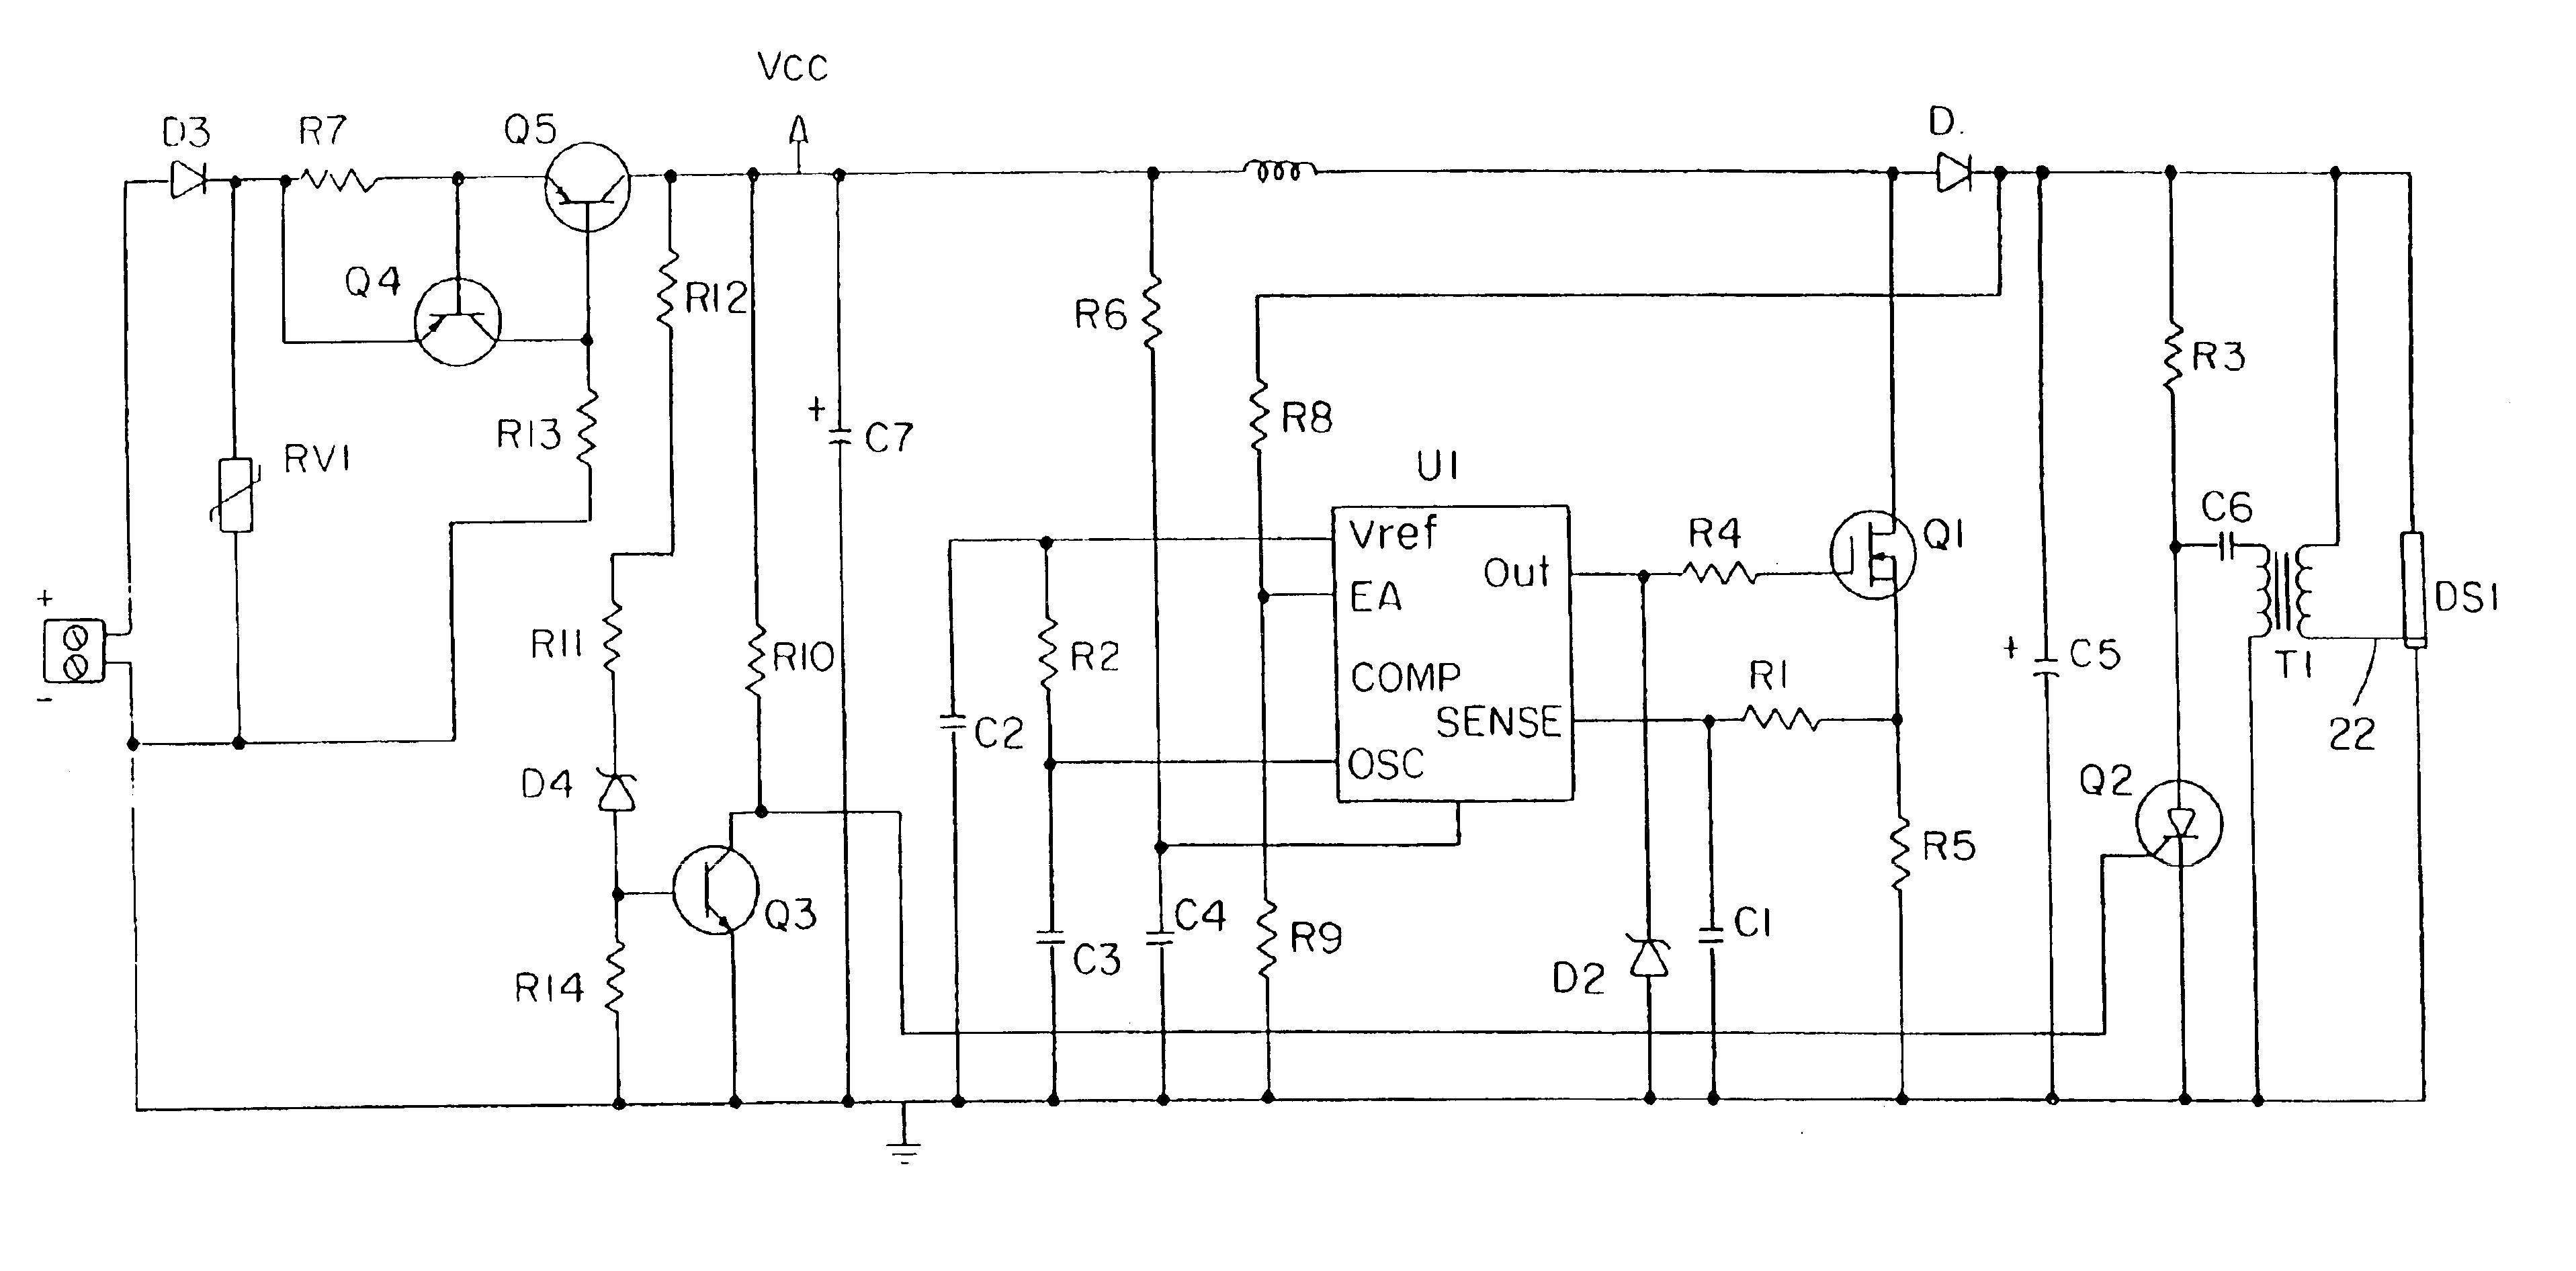 Wg 8707 Simplex Strobe Wiring Diagram Get Free Image About Wiring Diagram Wiring Diagram